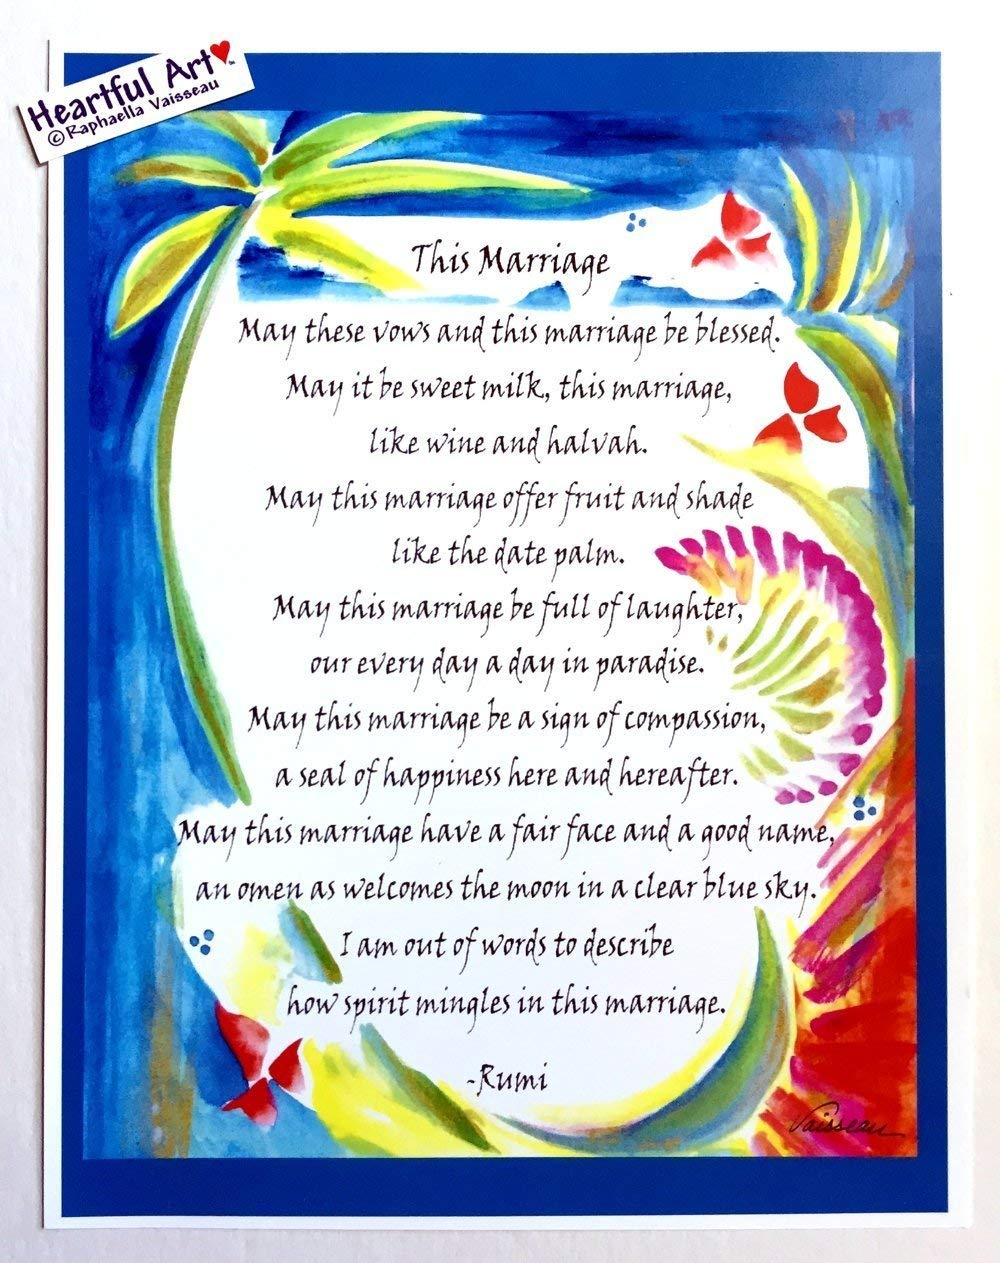 This Marriage 8x11 Rumi wedding poster - Heartful Art by Raphaella Vaisseau